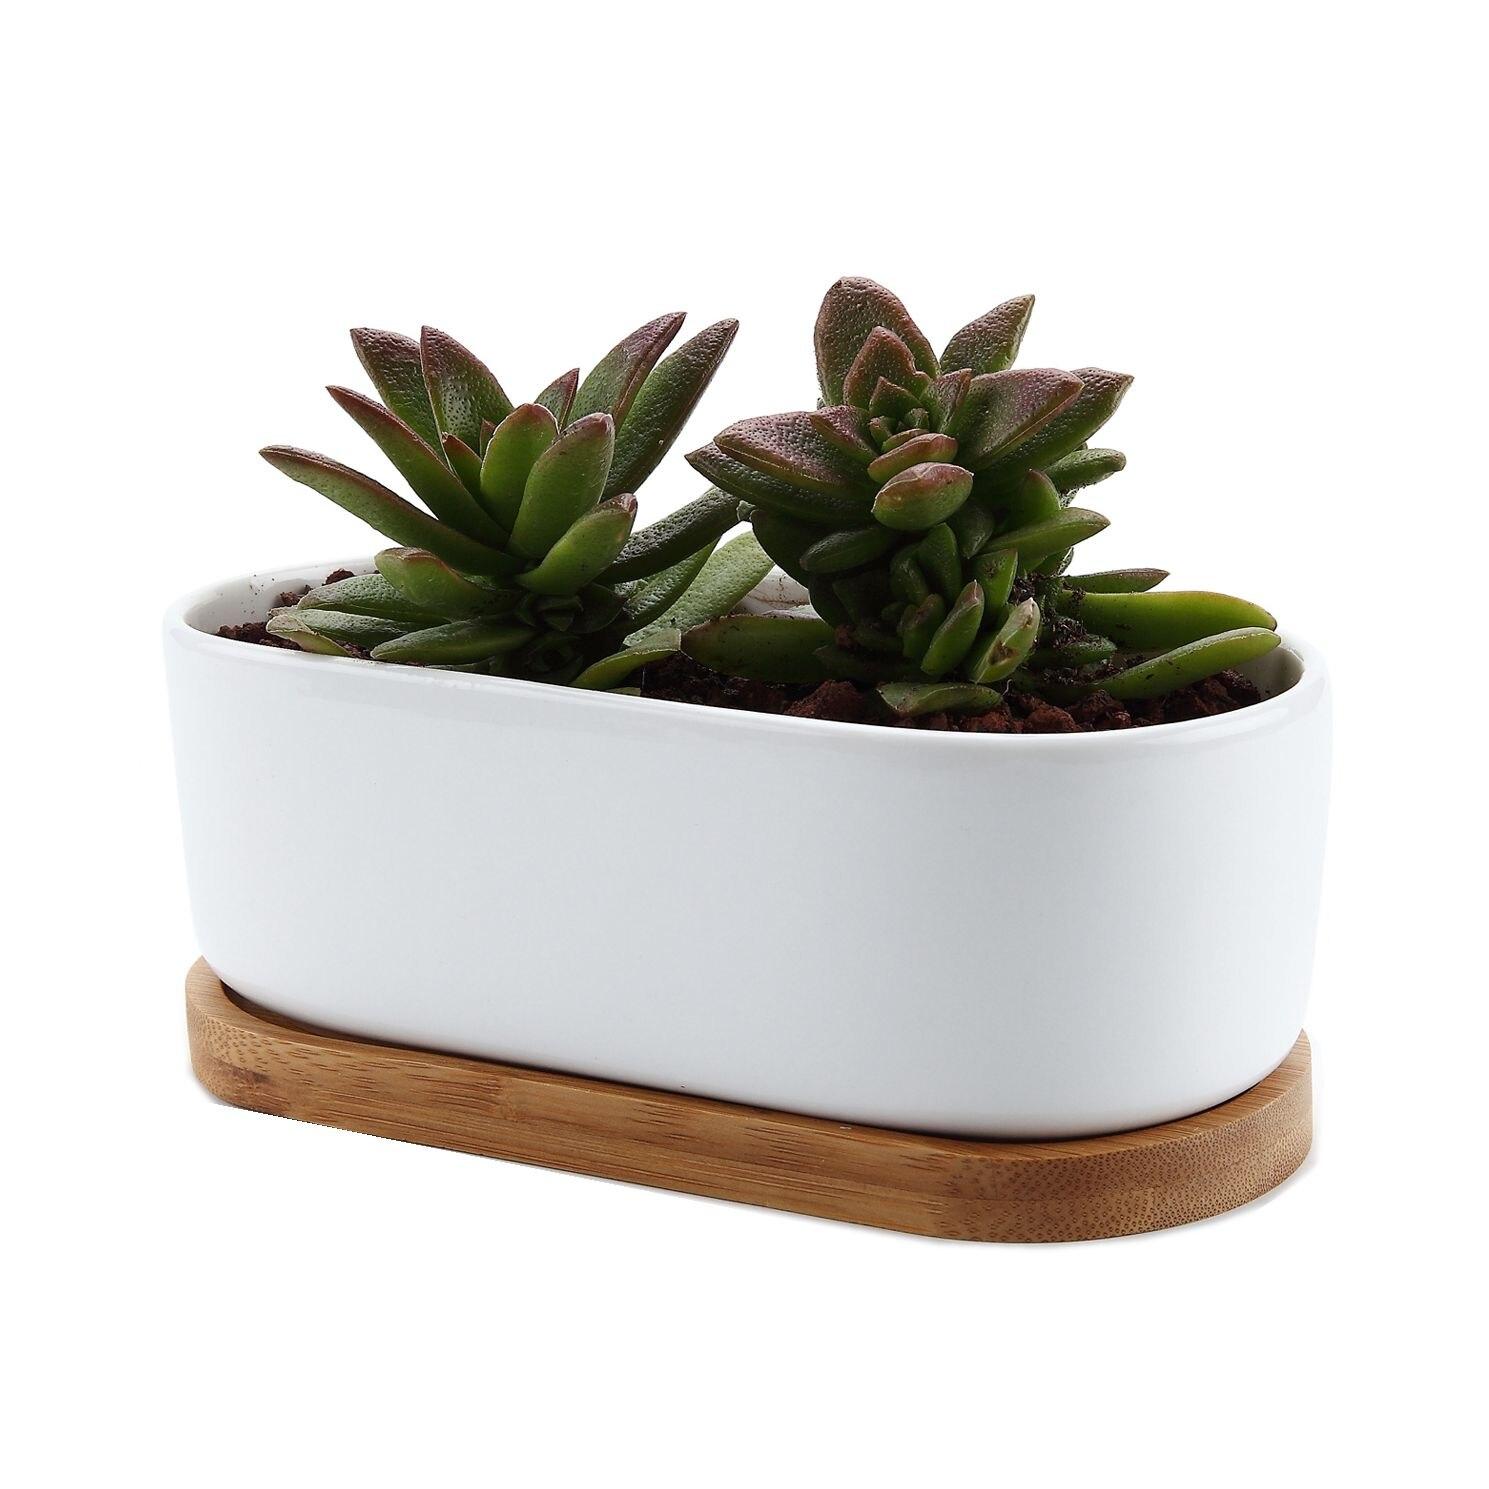 T4U Ceramic Rectangular Succulent Flower Planter Pot Maceta Bonsai Pots With Bamboo Tray Home Office Decoration